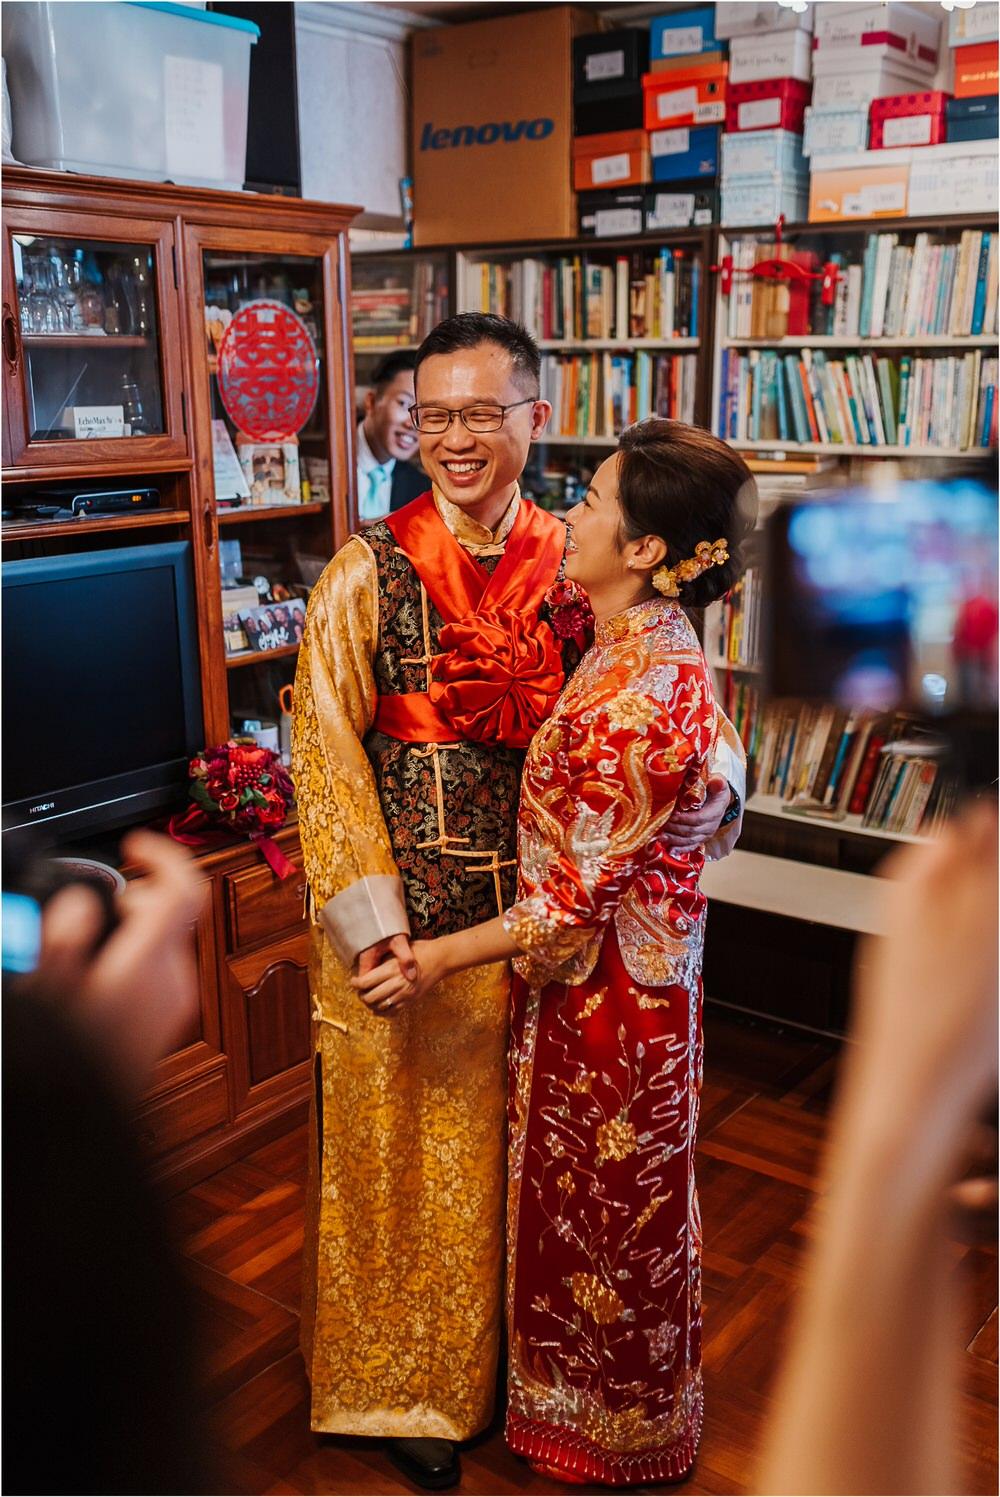 hong kong wedding photographer intercontinental kowloon chinese tea ceremony traditional wedding photography 0033.jpg